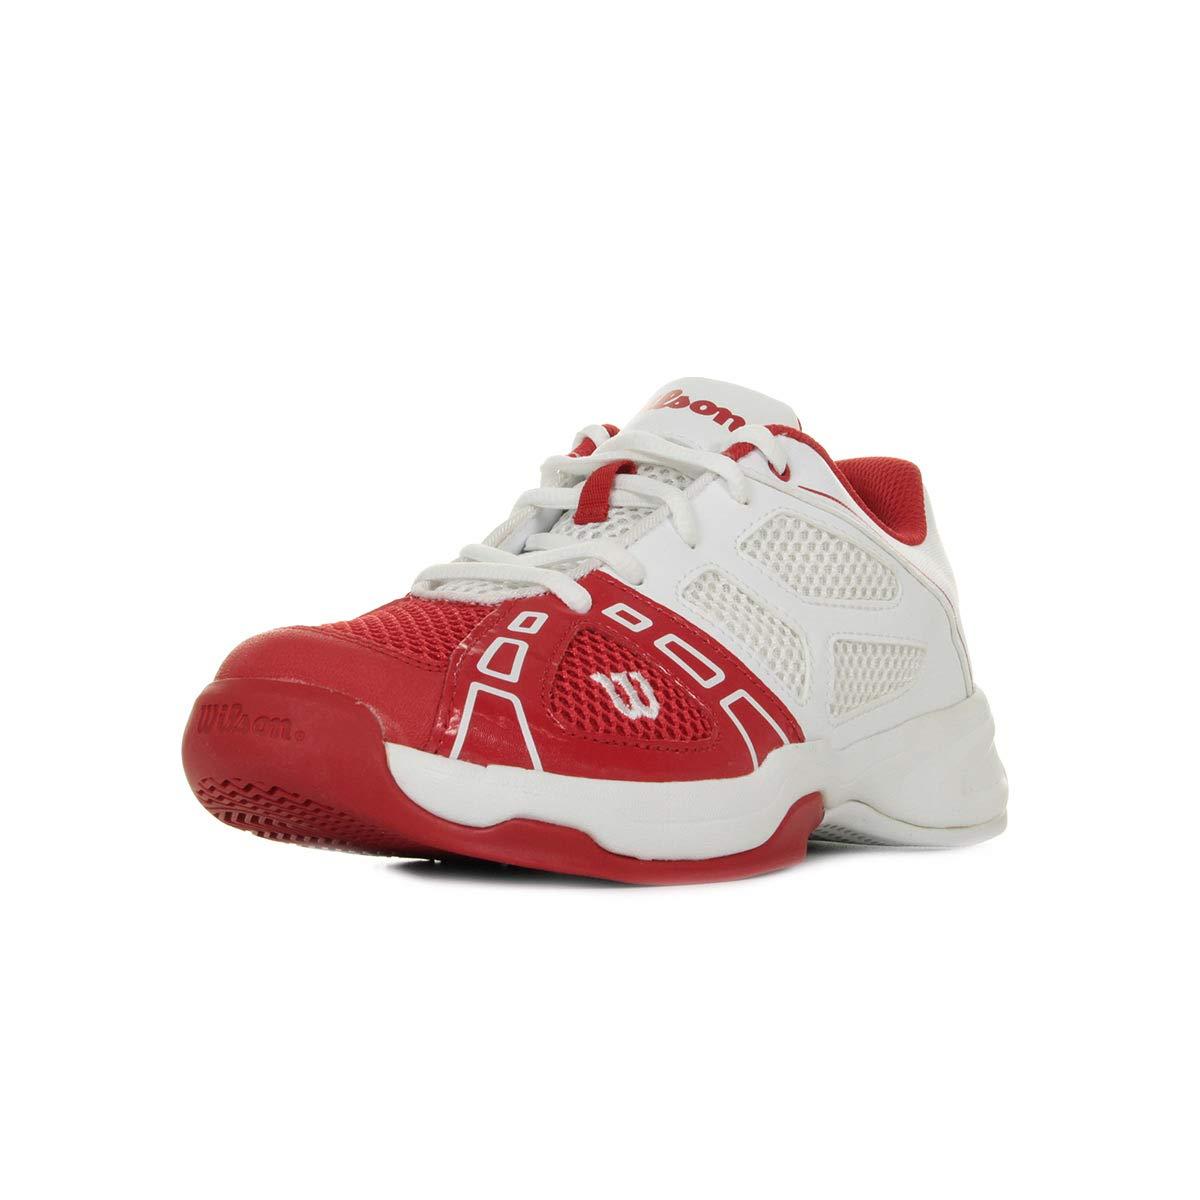 Wilson Rush Pro Junior 2 Tennisschuhe Kinder Rot Weiß REFERENCE_PRODUCT